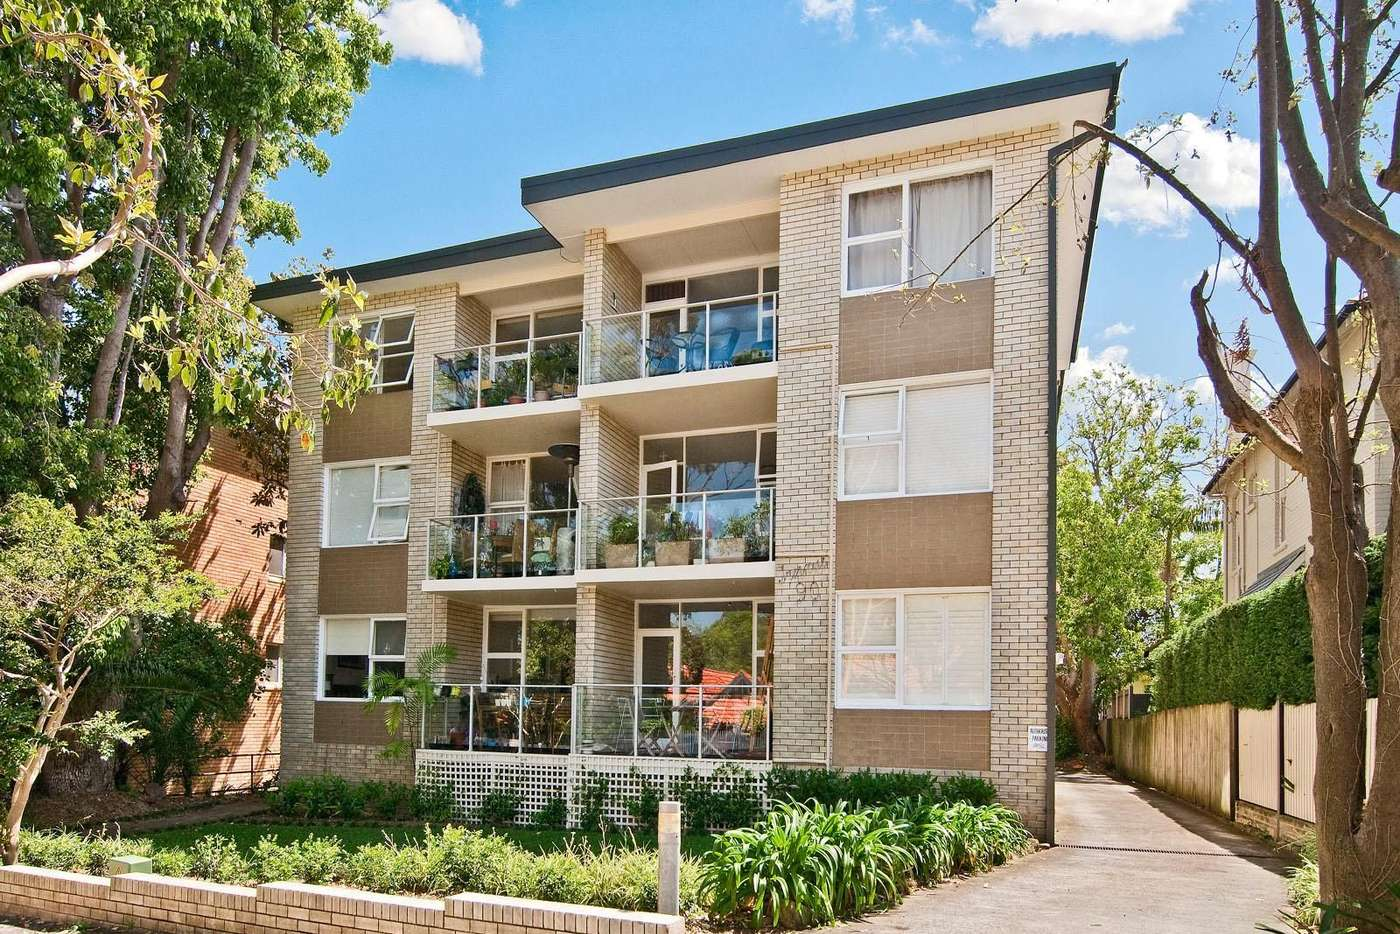 Main view of Homely apartment listing, 12/90 Raglan Street, Mosman NSW 2088